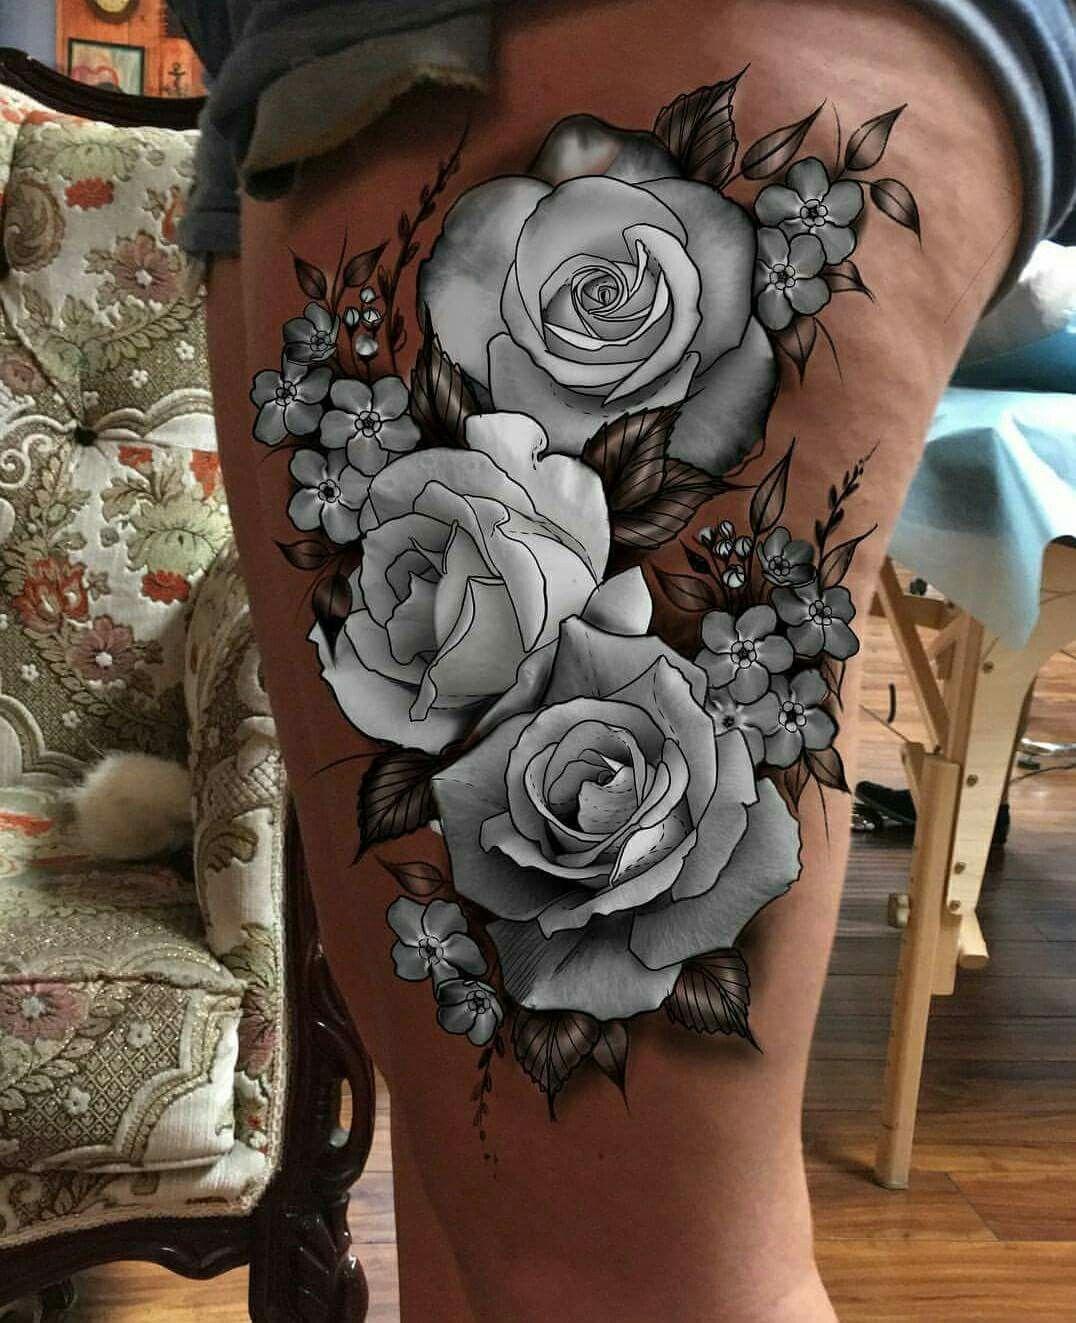 White roses tattoo | White rose tattoos, Rose tattoos ...